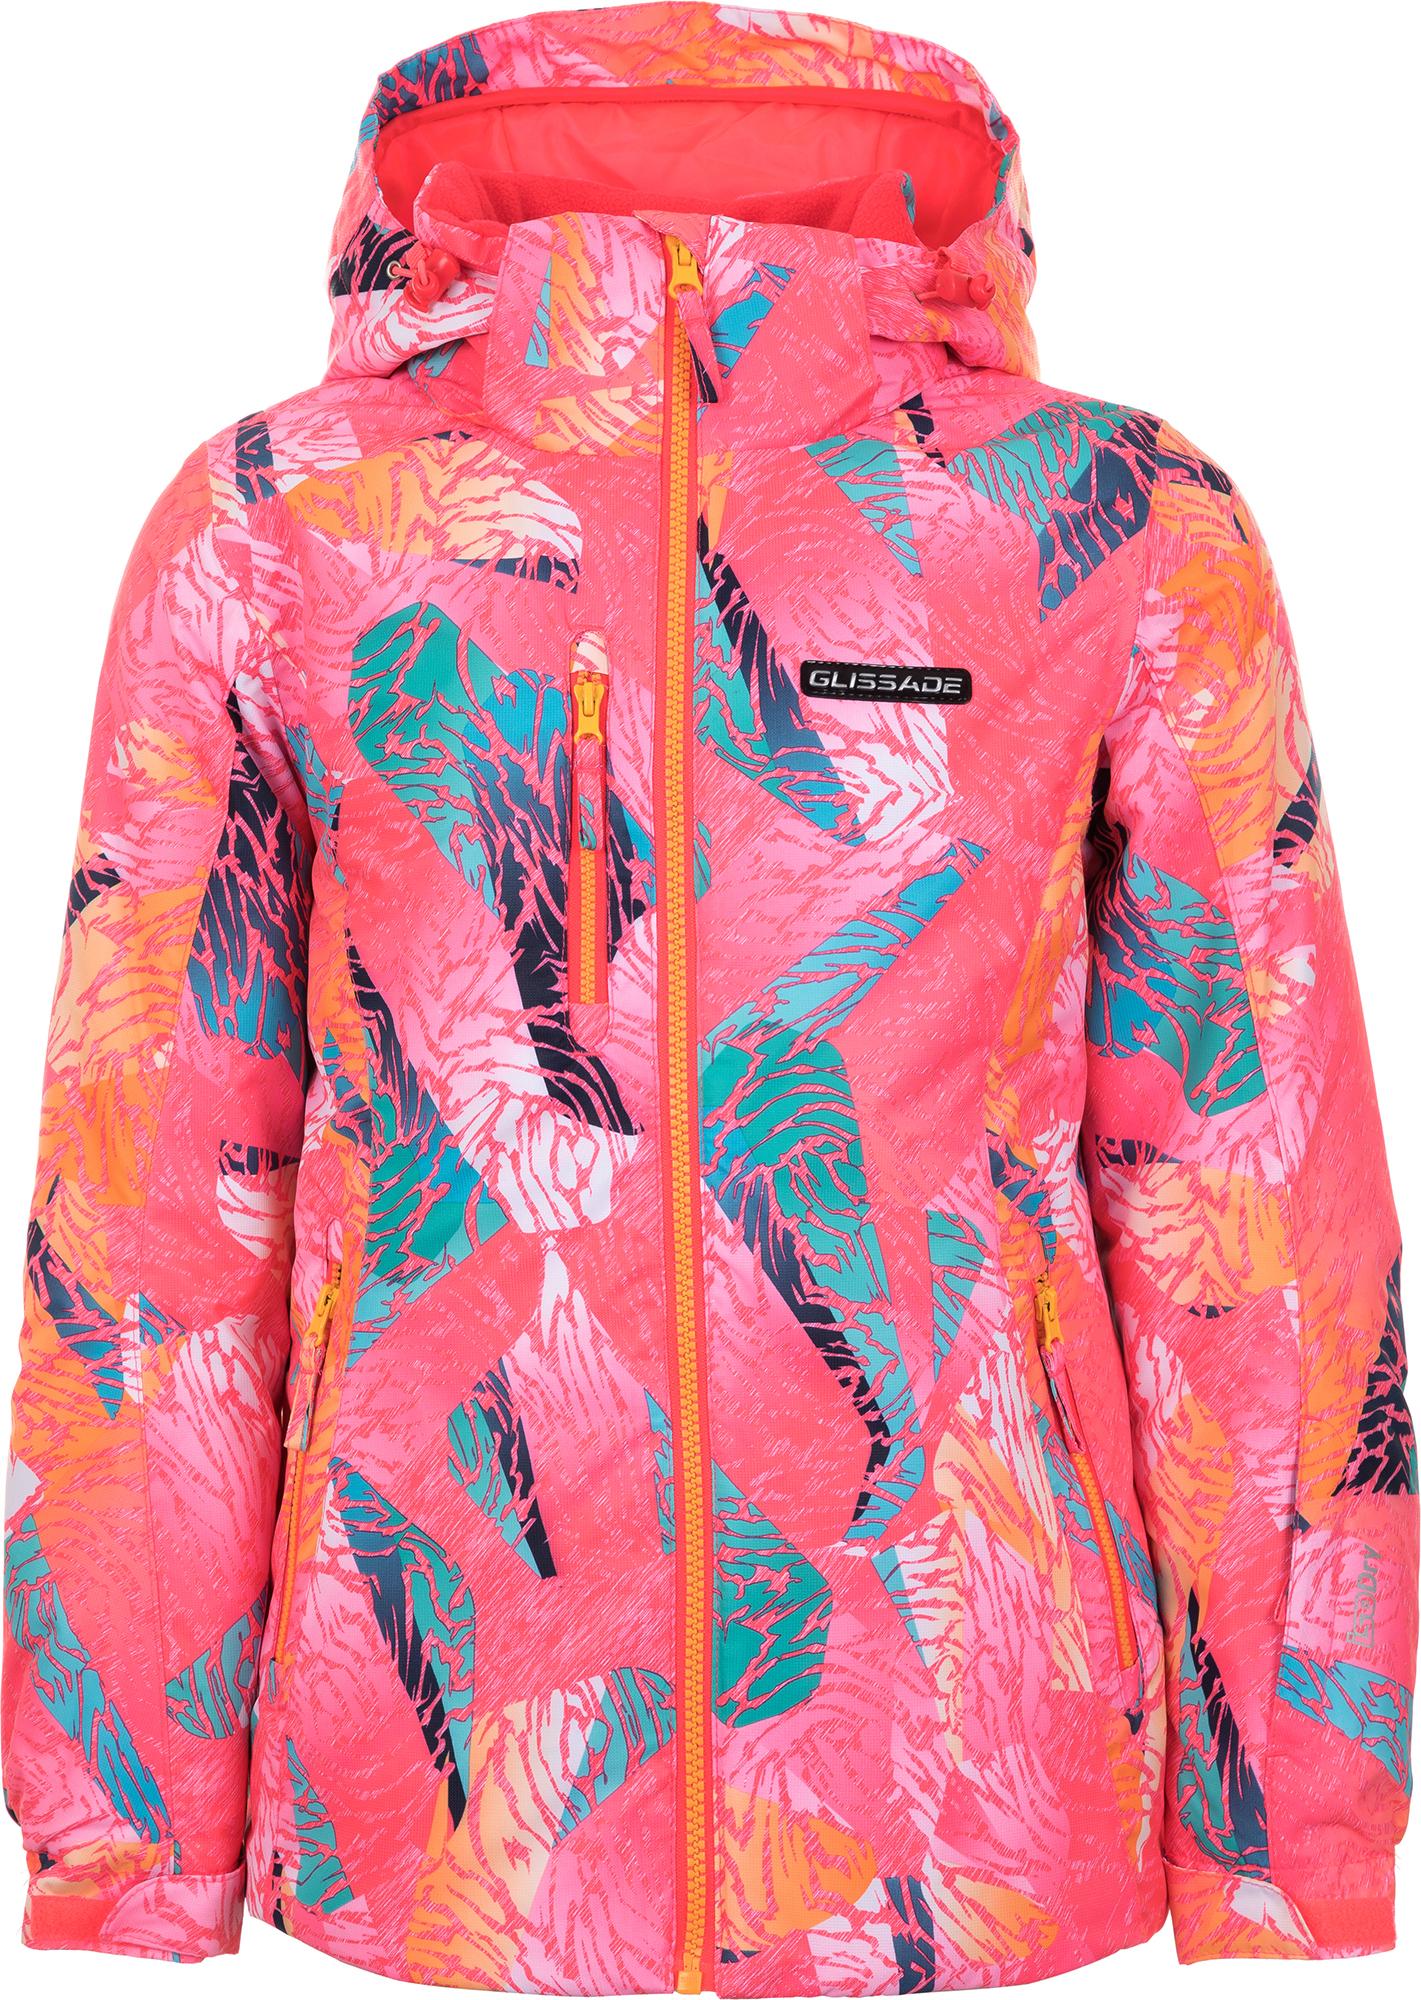 Glissade Куртка утепленная для девочек Glissade, размер 164